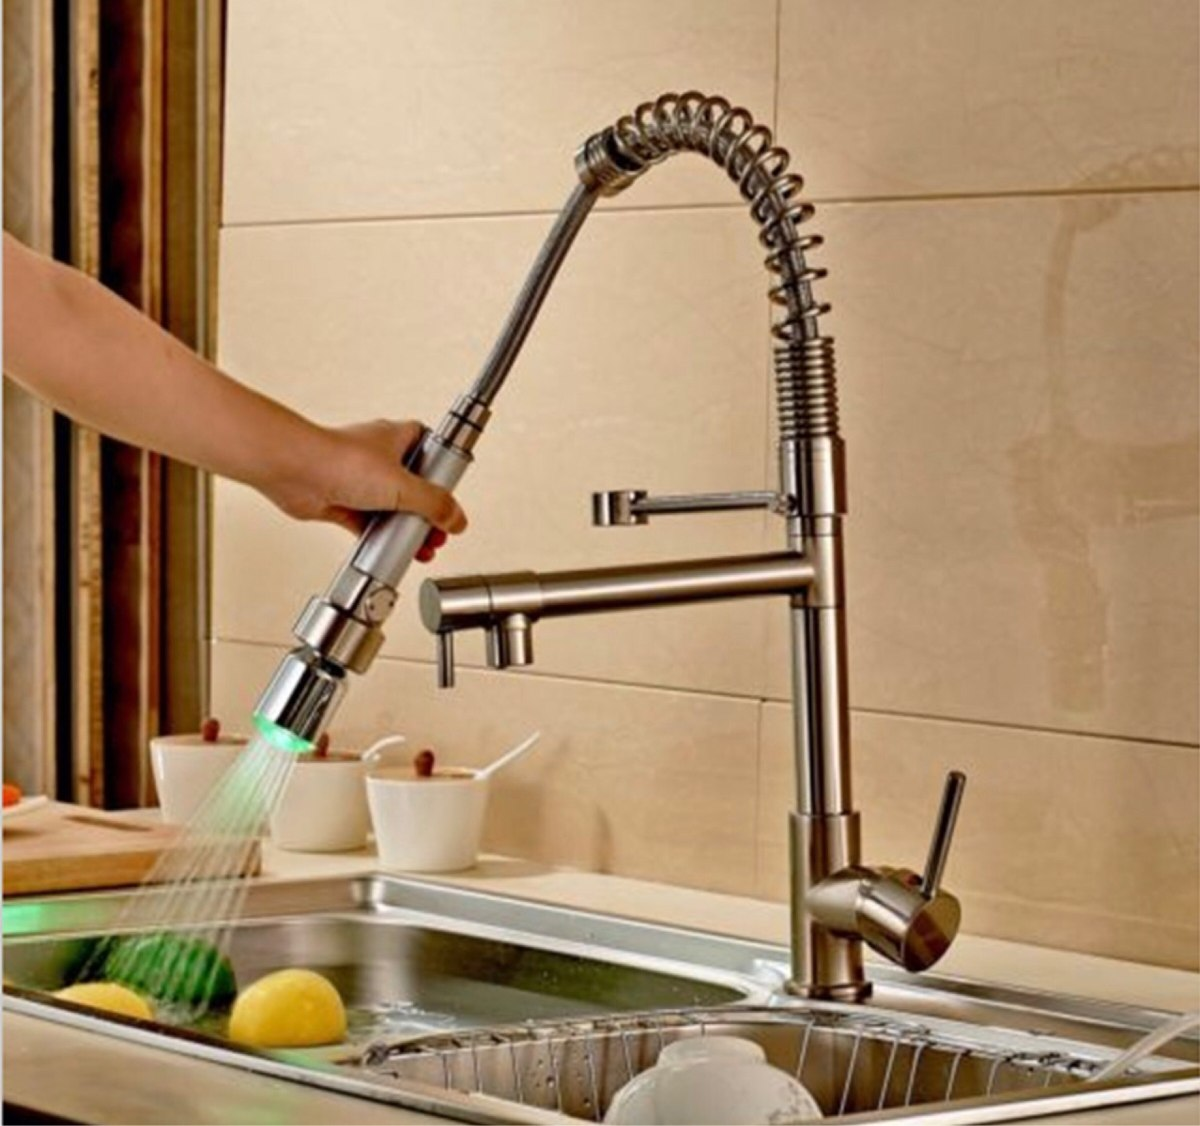 Llave mezcladora monomando grifo cocina niquel c led r0 for Llaves mezcladoras para cocina